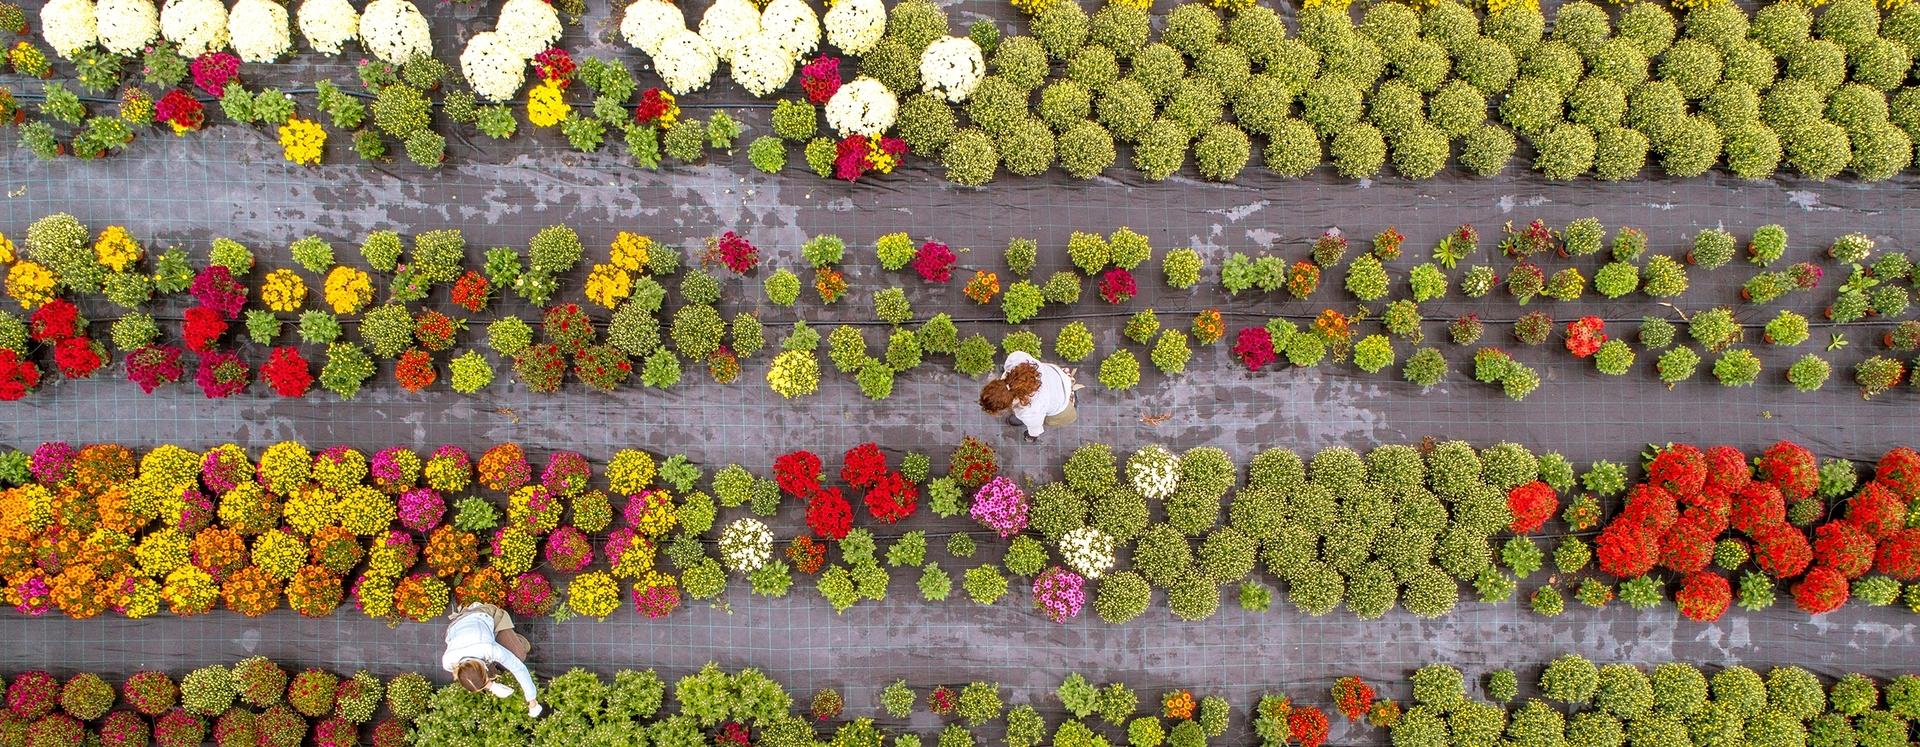 Full Size of Garten Versicherung Ergo Huk24 Huk Allianz Versicherungen Versichern Generali Vergleich Devk Check24 Brunnen Im Whirlpool Aufblasbar Pavillion Led Spot Garten Garten Versicherung